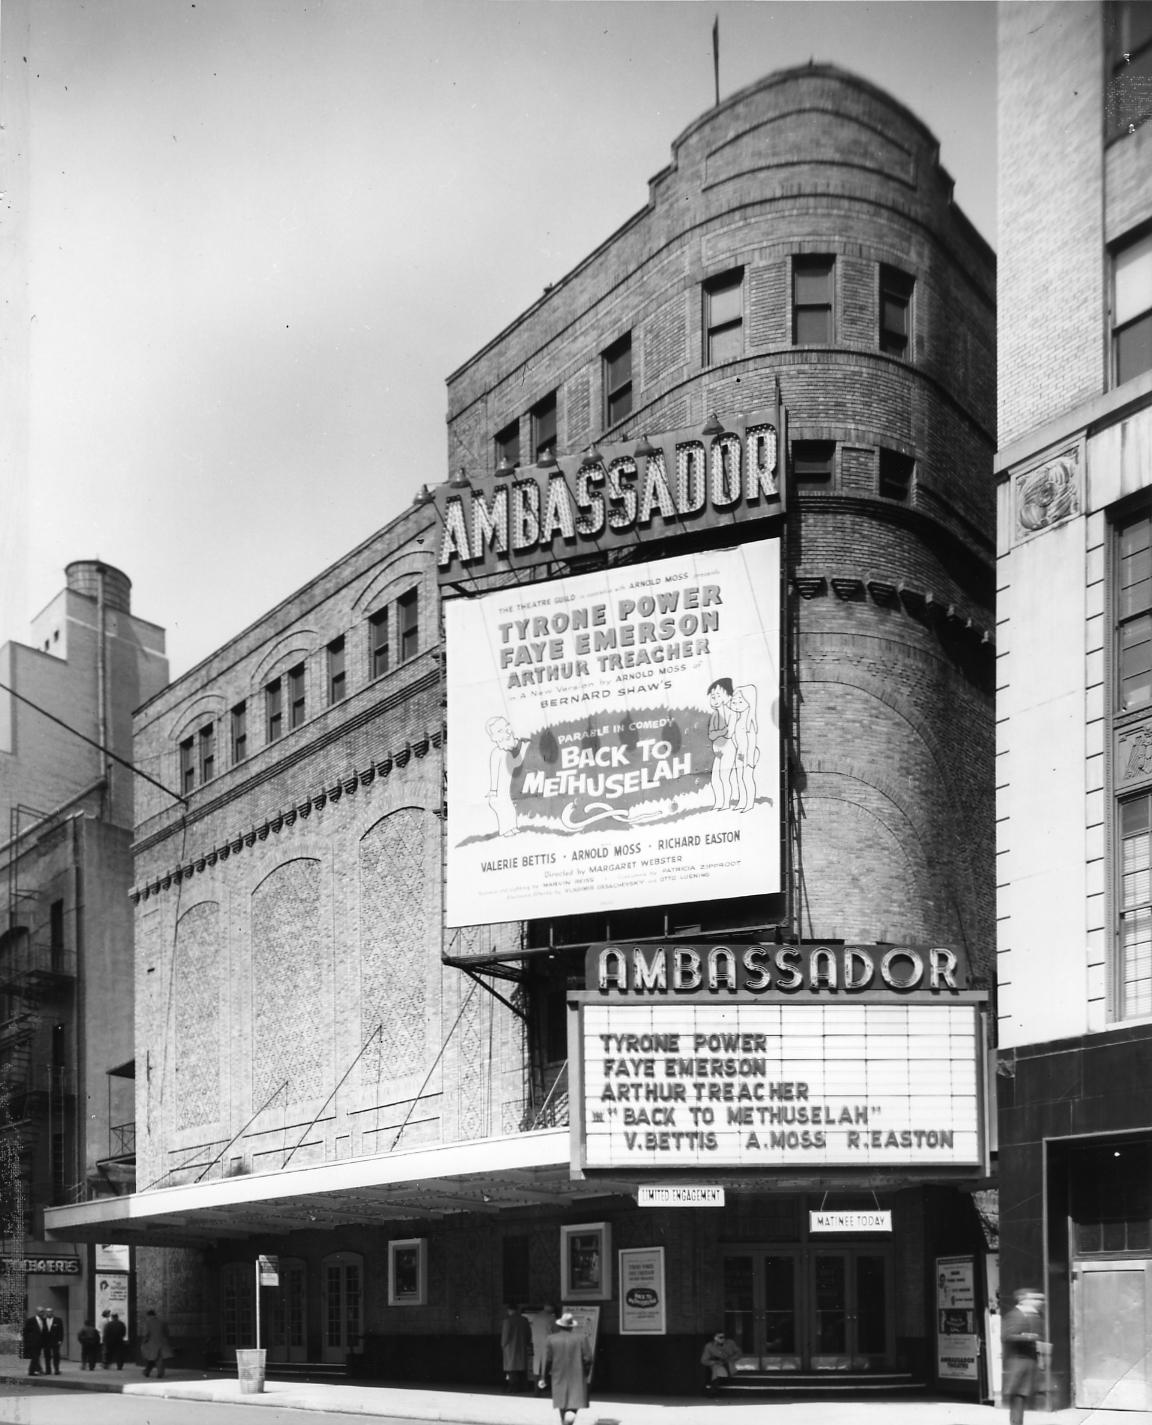 Ambassador Theatre Shubert Organization